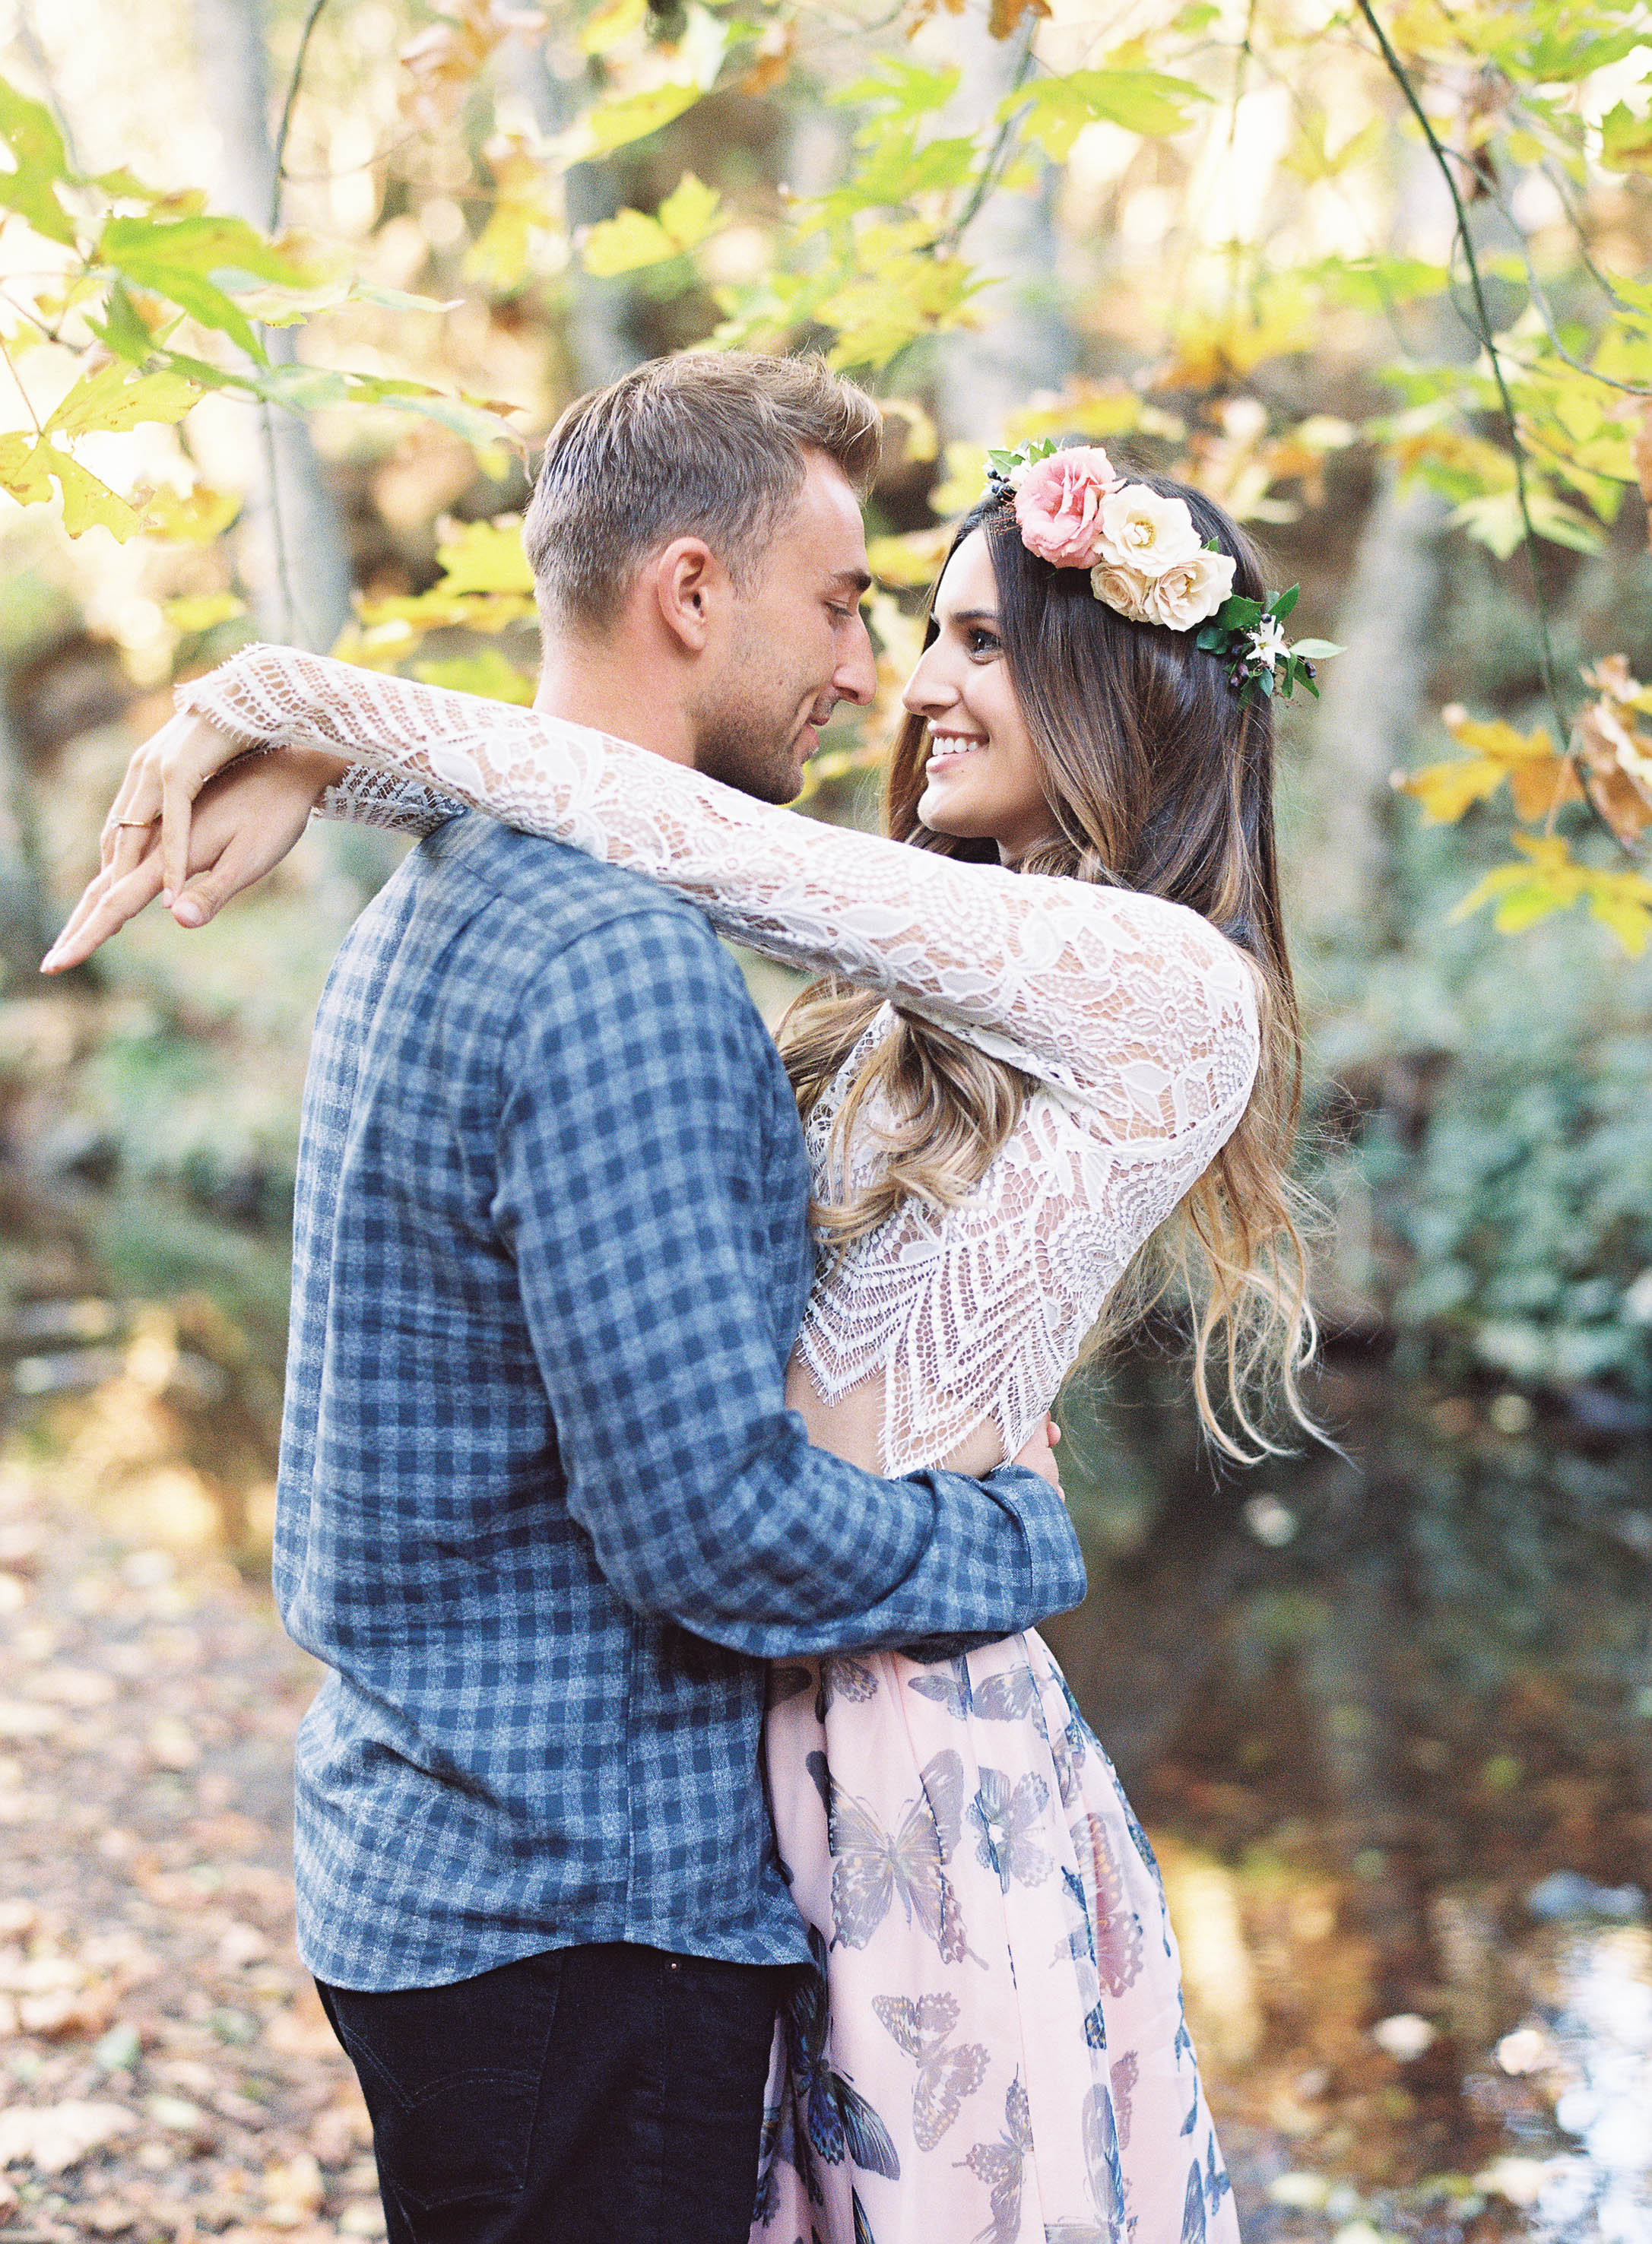 Meghan Mehan Photography - Fine Art Film Wedding Photography - San Francisco | Napa | Sonoma | Big Sur | Chicago | Minneapolis | Milwaukee | Lake Geneva | Door County | Wisconsin 052.jpg